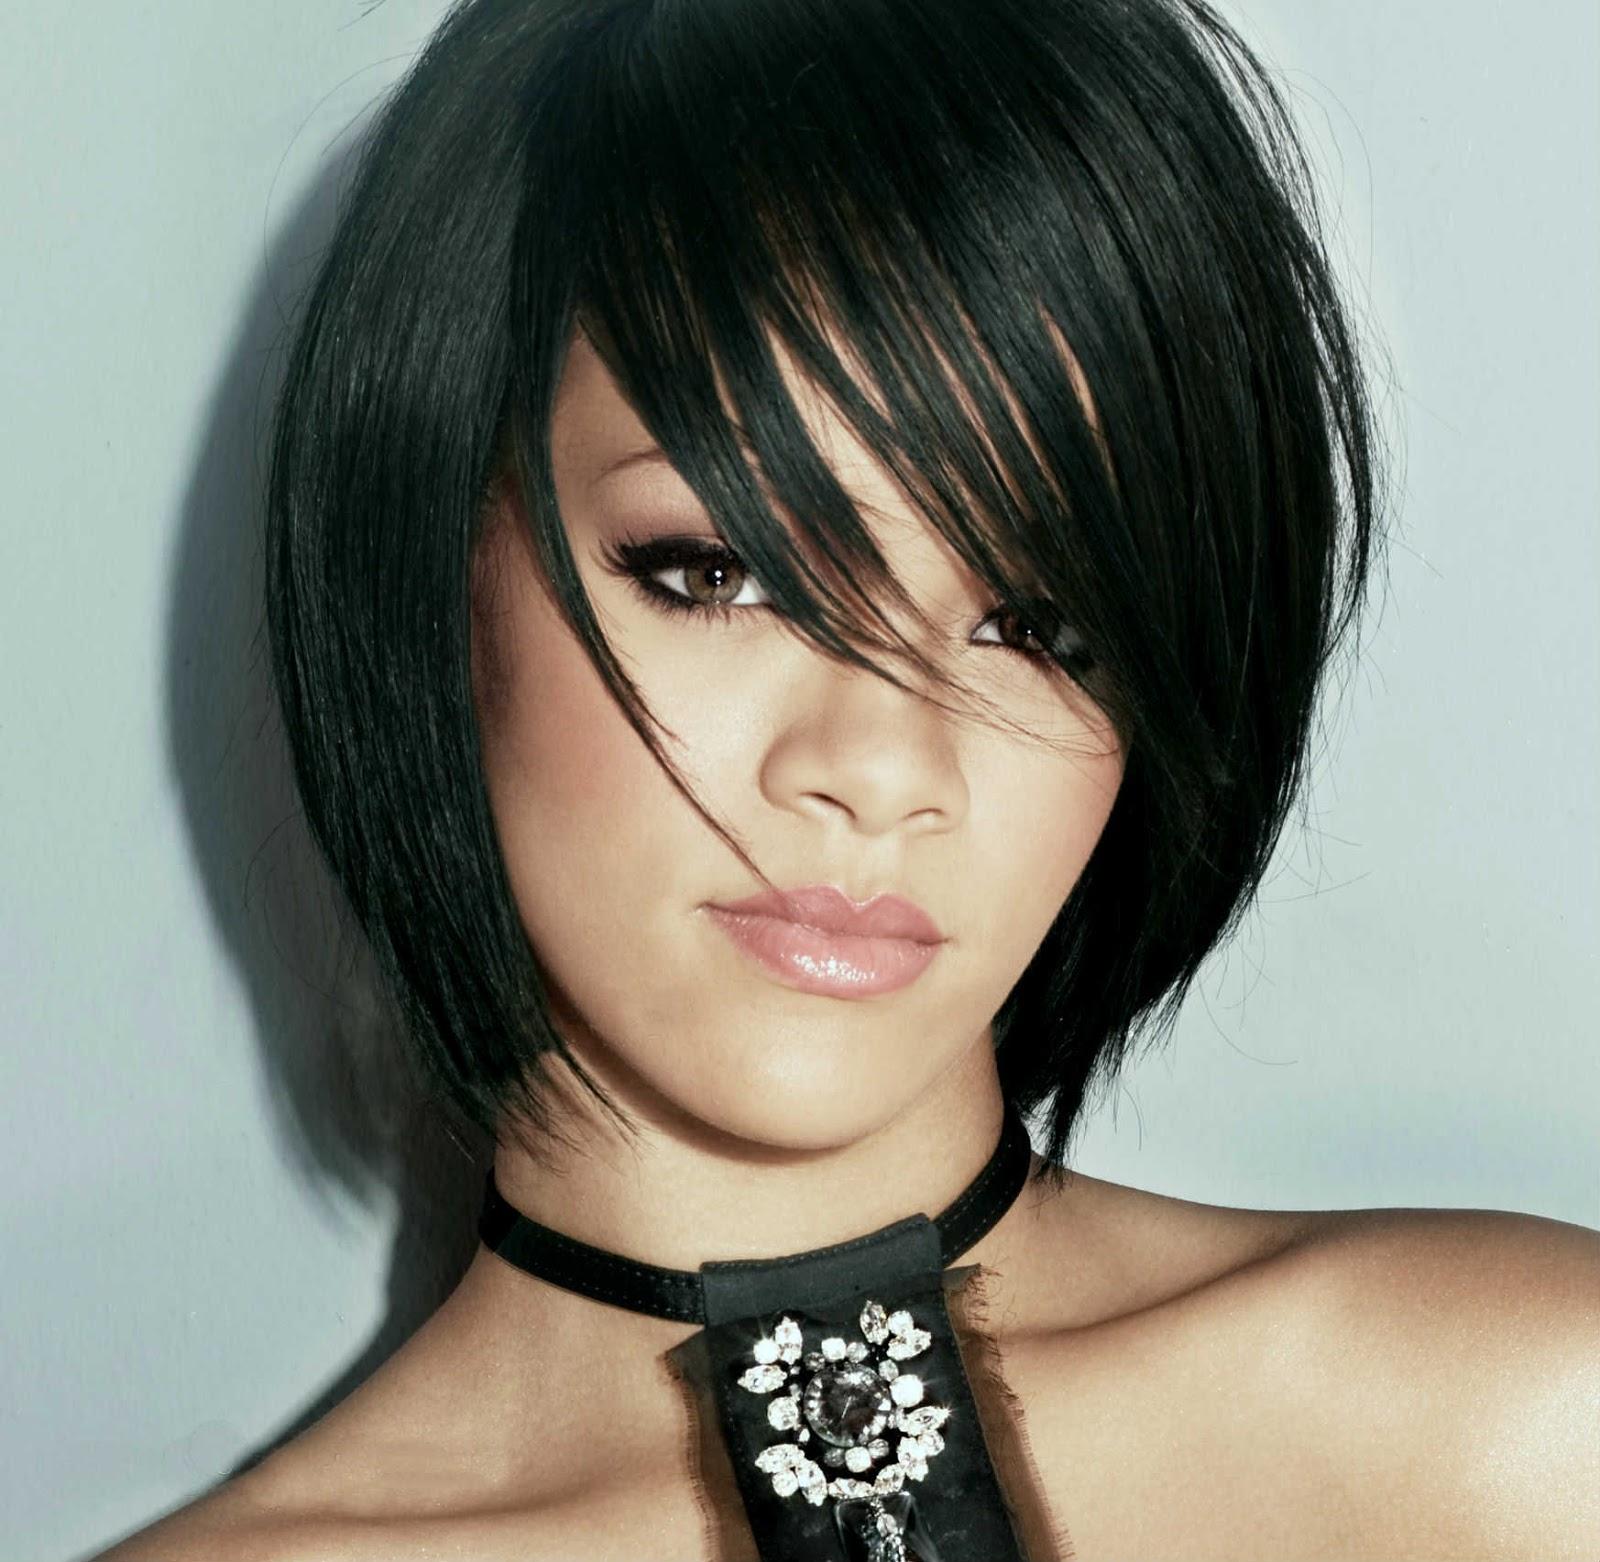 Hairstyles Wallpaper: Rihanna Short Hair Style 2015 -o-